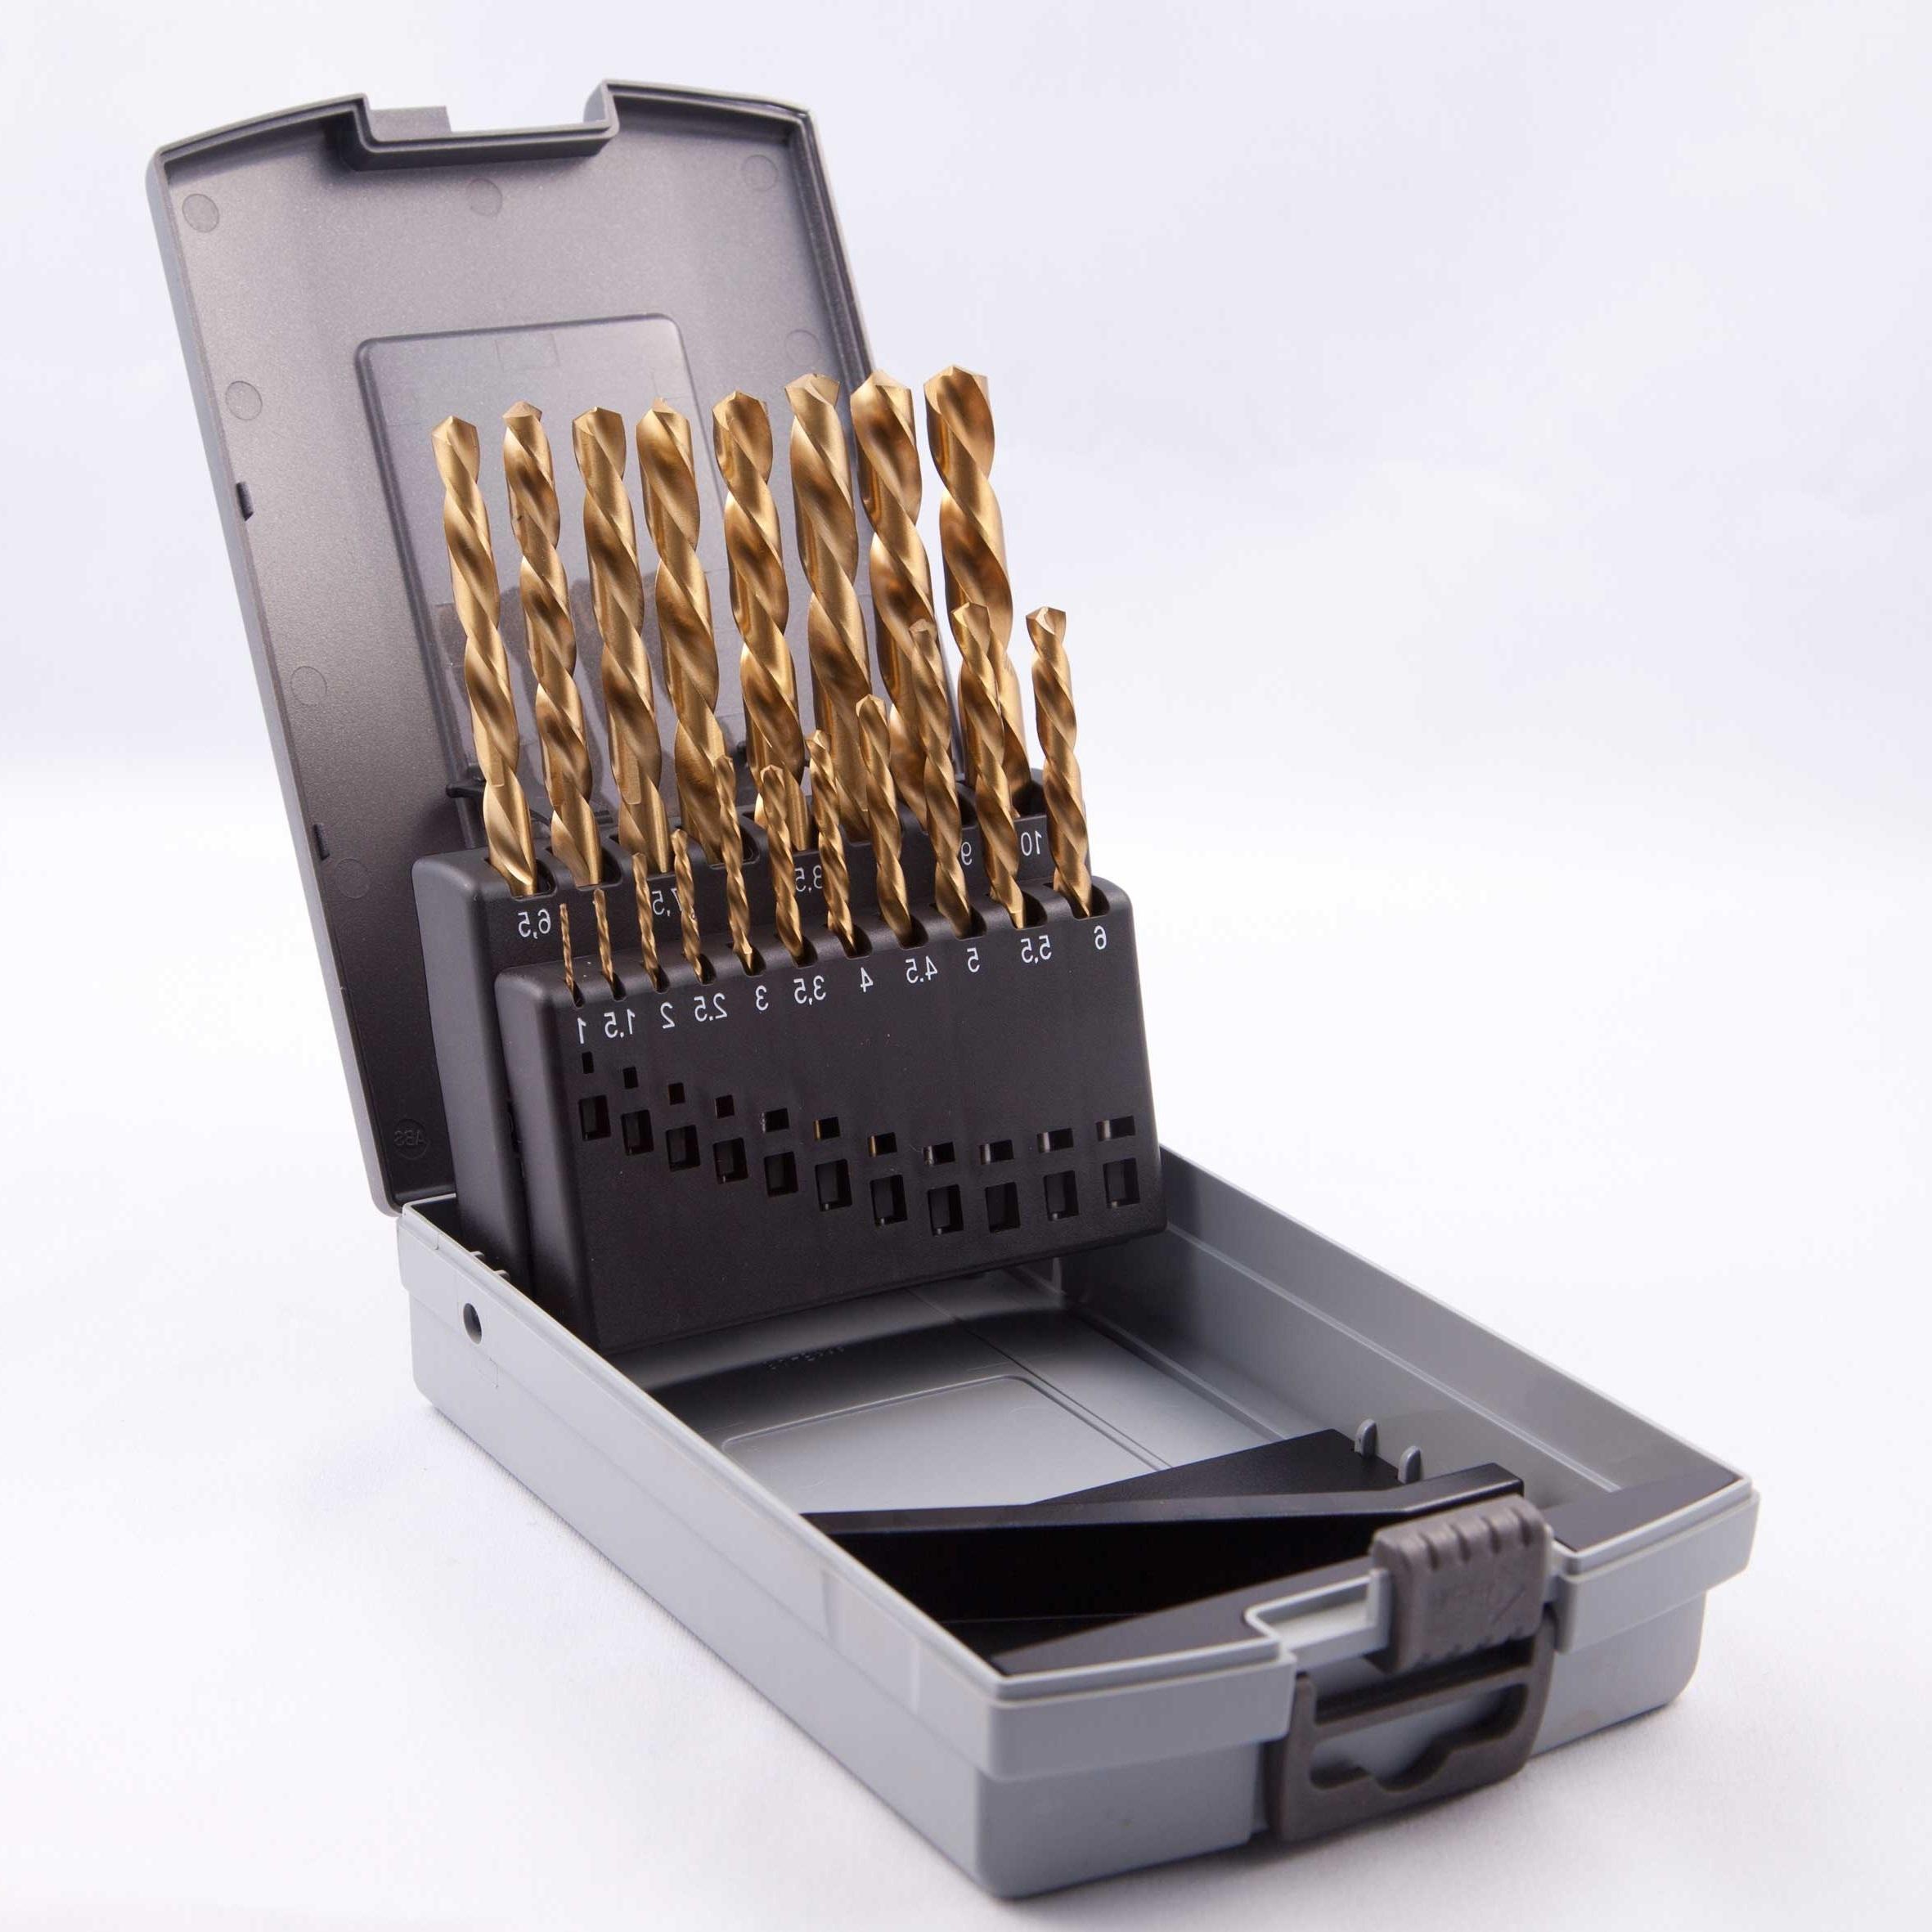 HSS Metallbohrer Spiralbohrerkassette Titan 19 teilig Metall Bohrer Set Satz